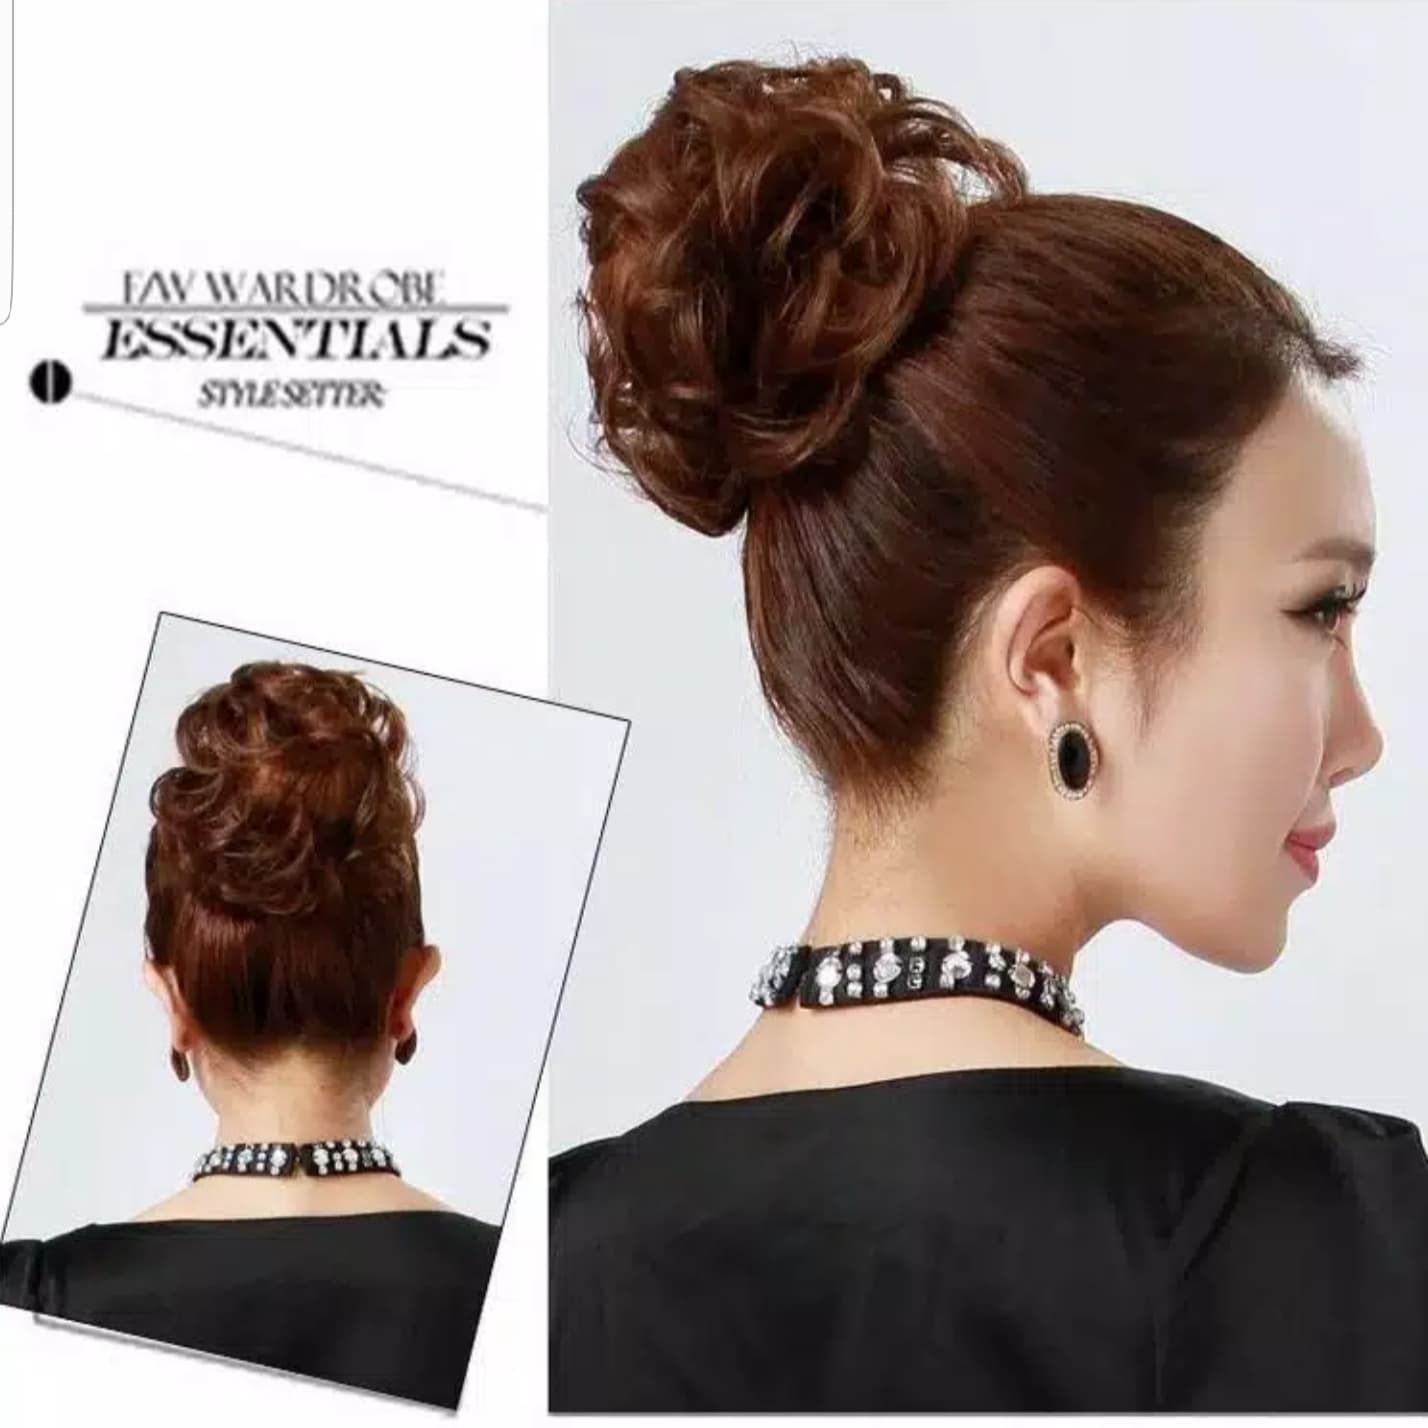 Ikat Rambut Elastis Wig Rambut Palsu Curly Wigs Hair Bun Extension - Black thumbnail